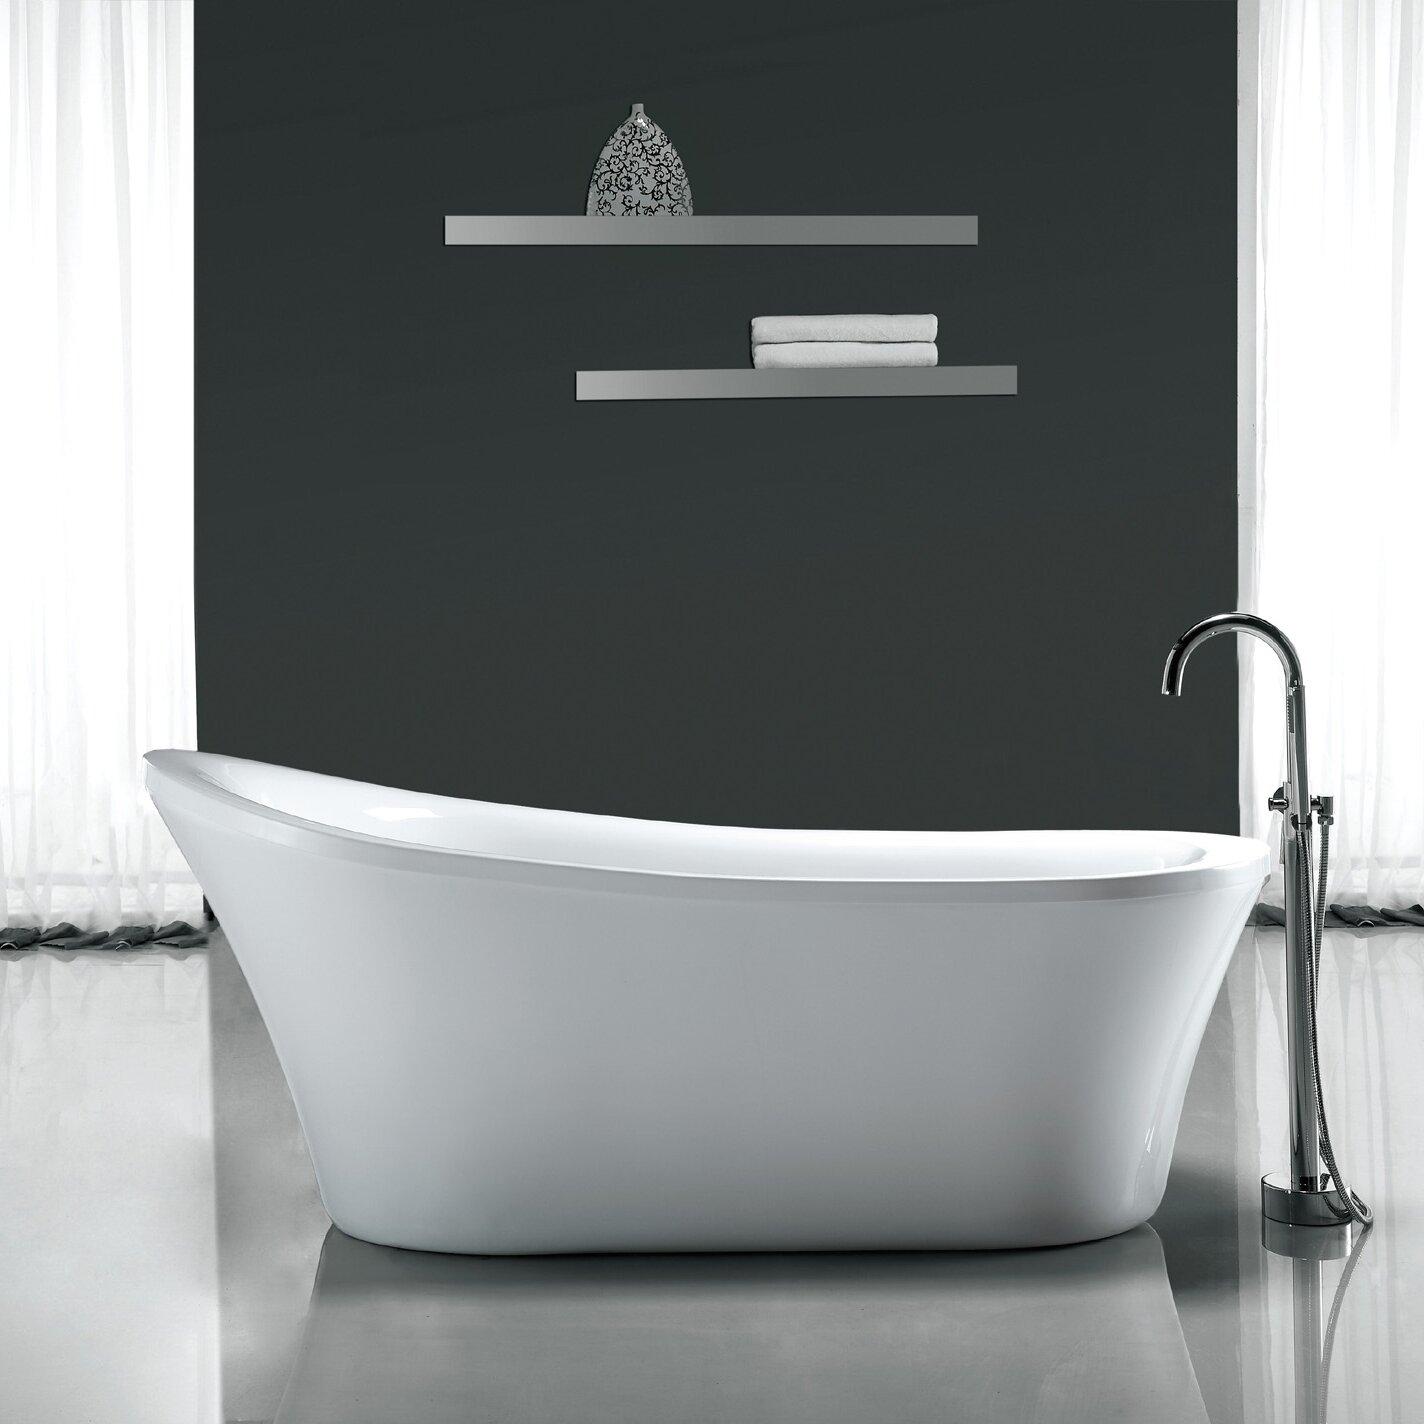 "Freestanding Bathtub: Ove Decors Rachel 70"" X 34"" Freestanding Acrylic Slipper"